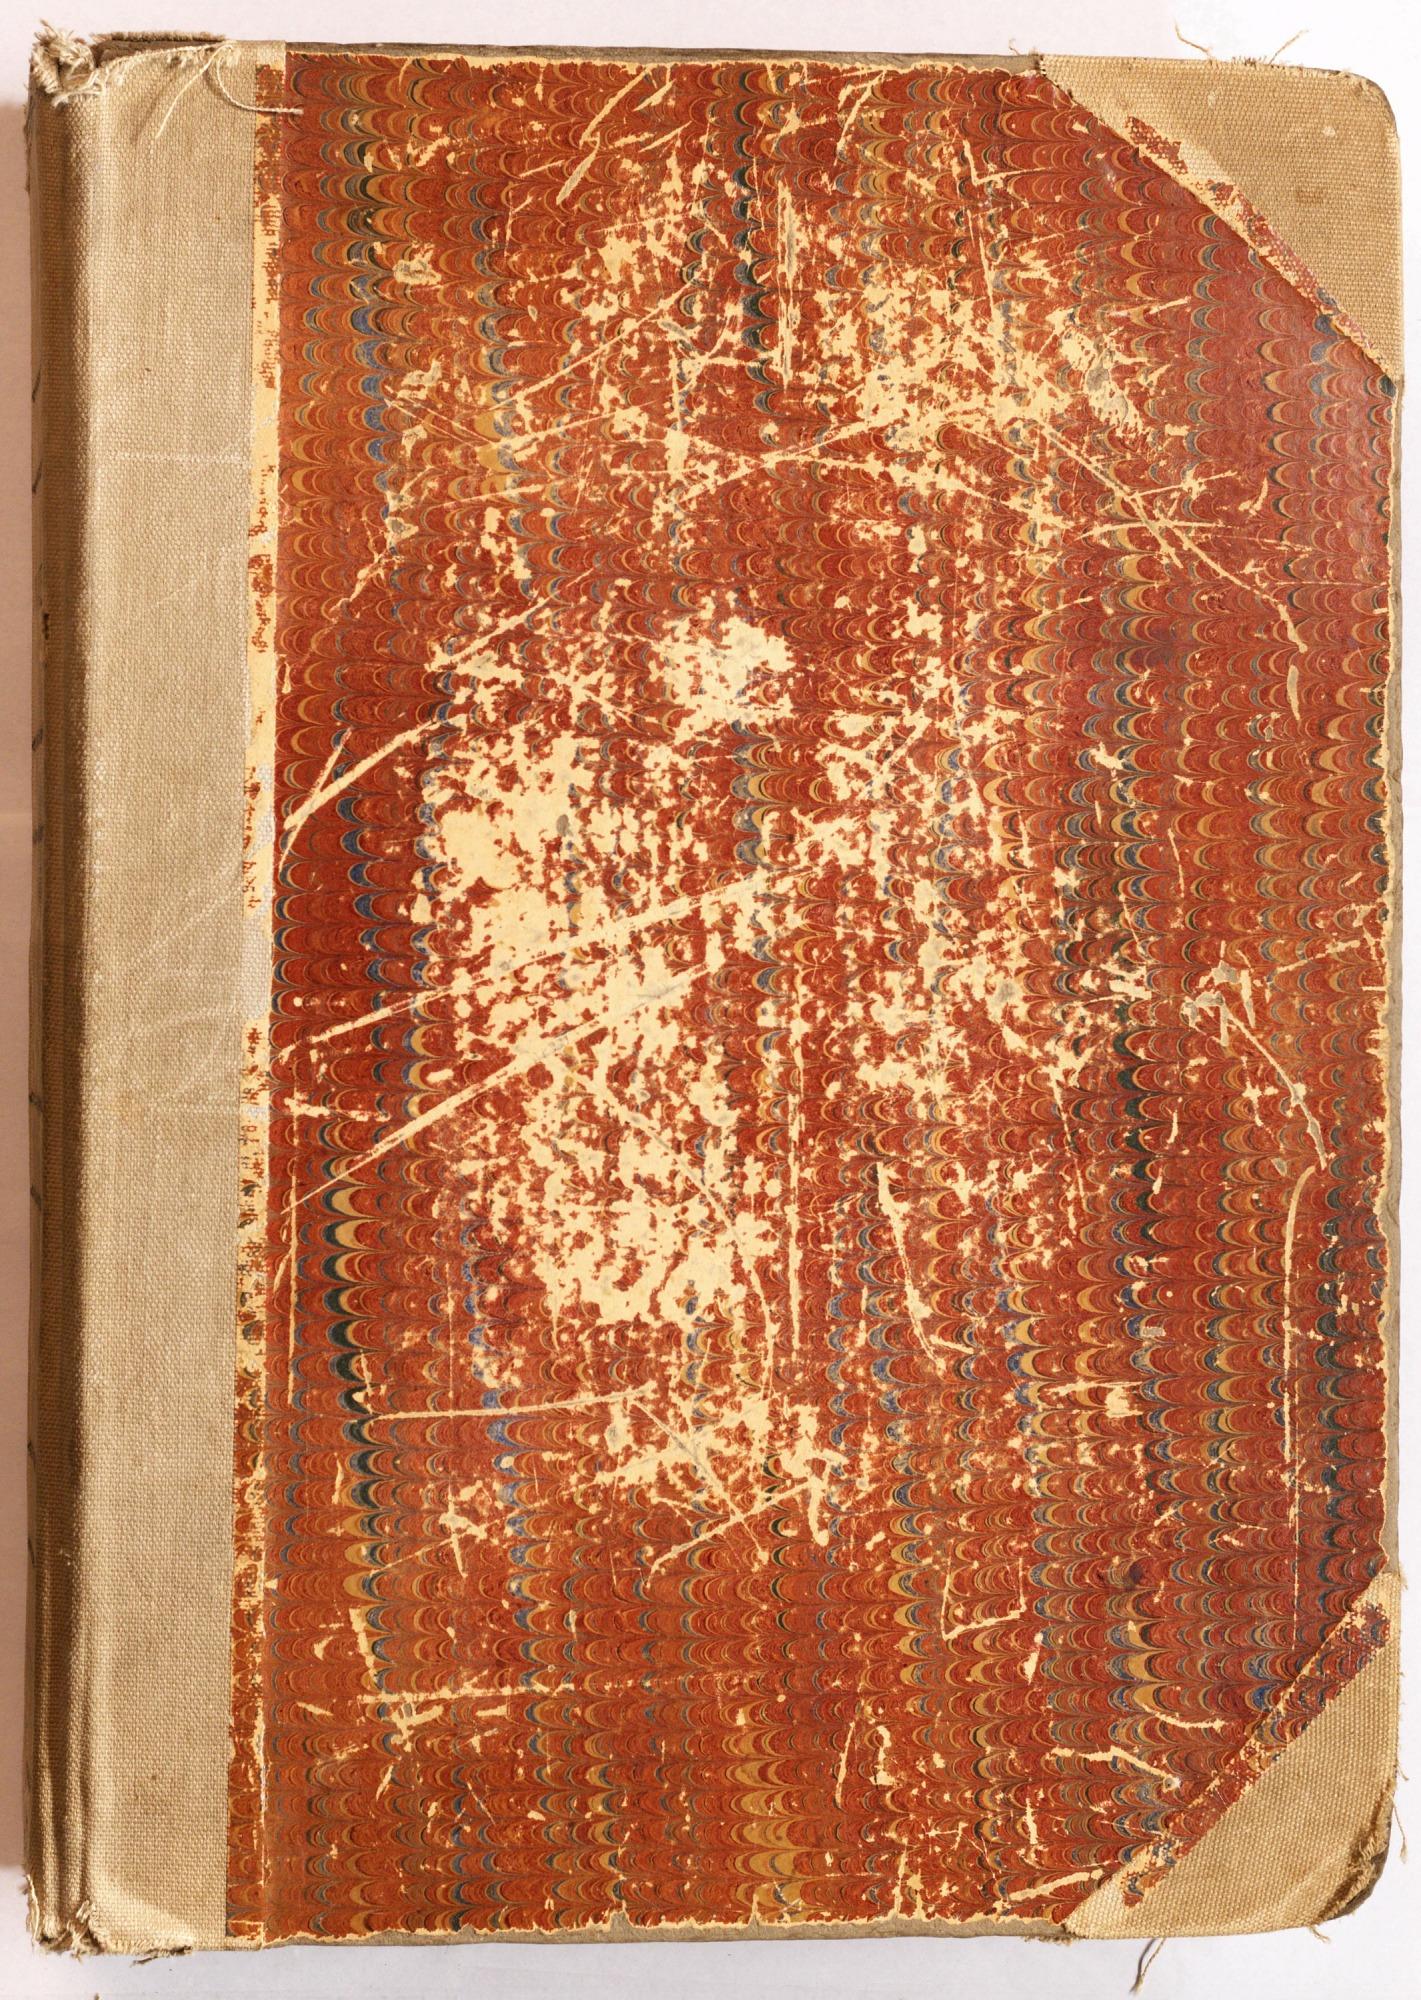 Fred Wiseman Scrapbook